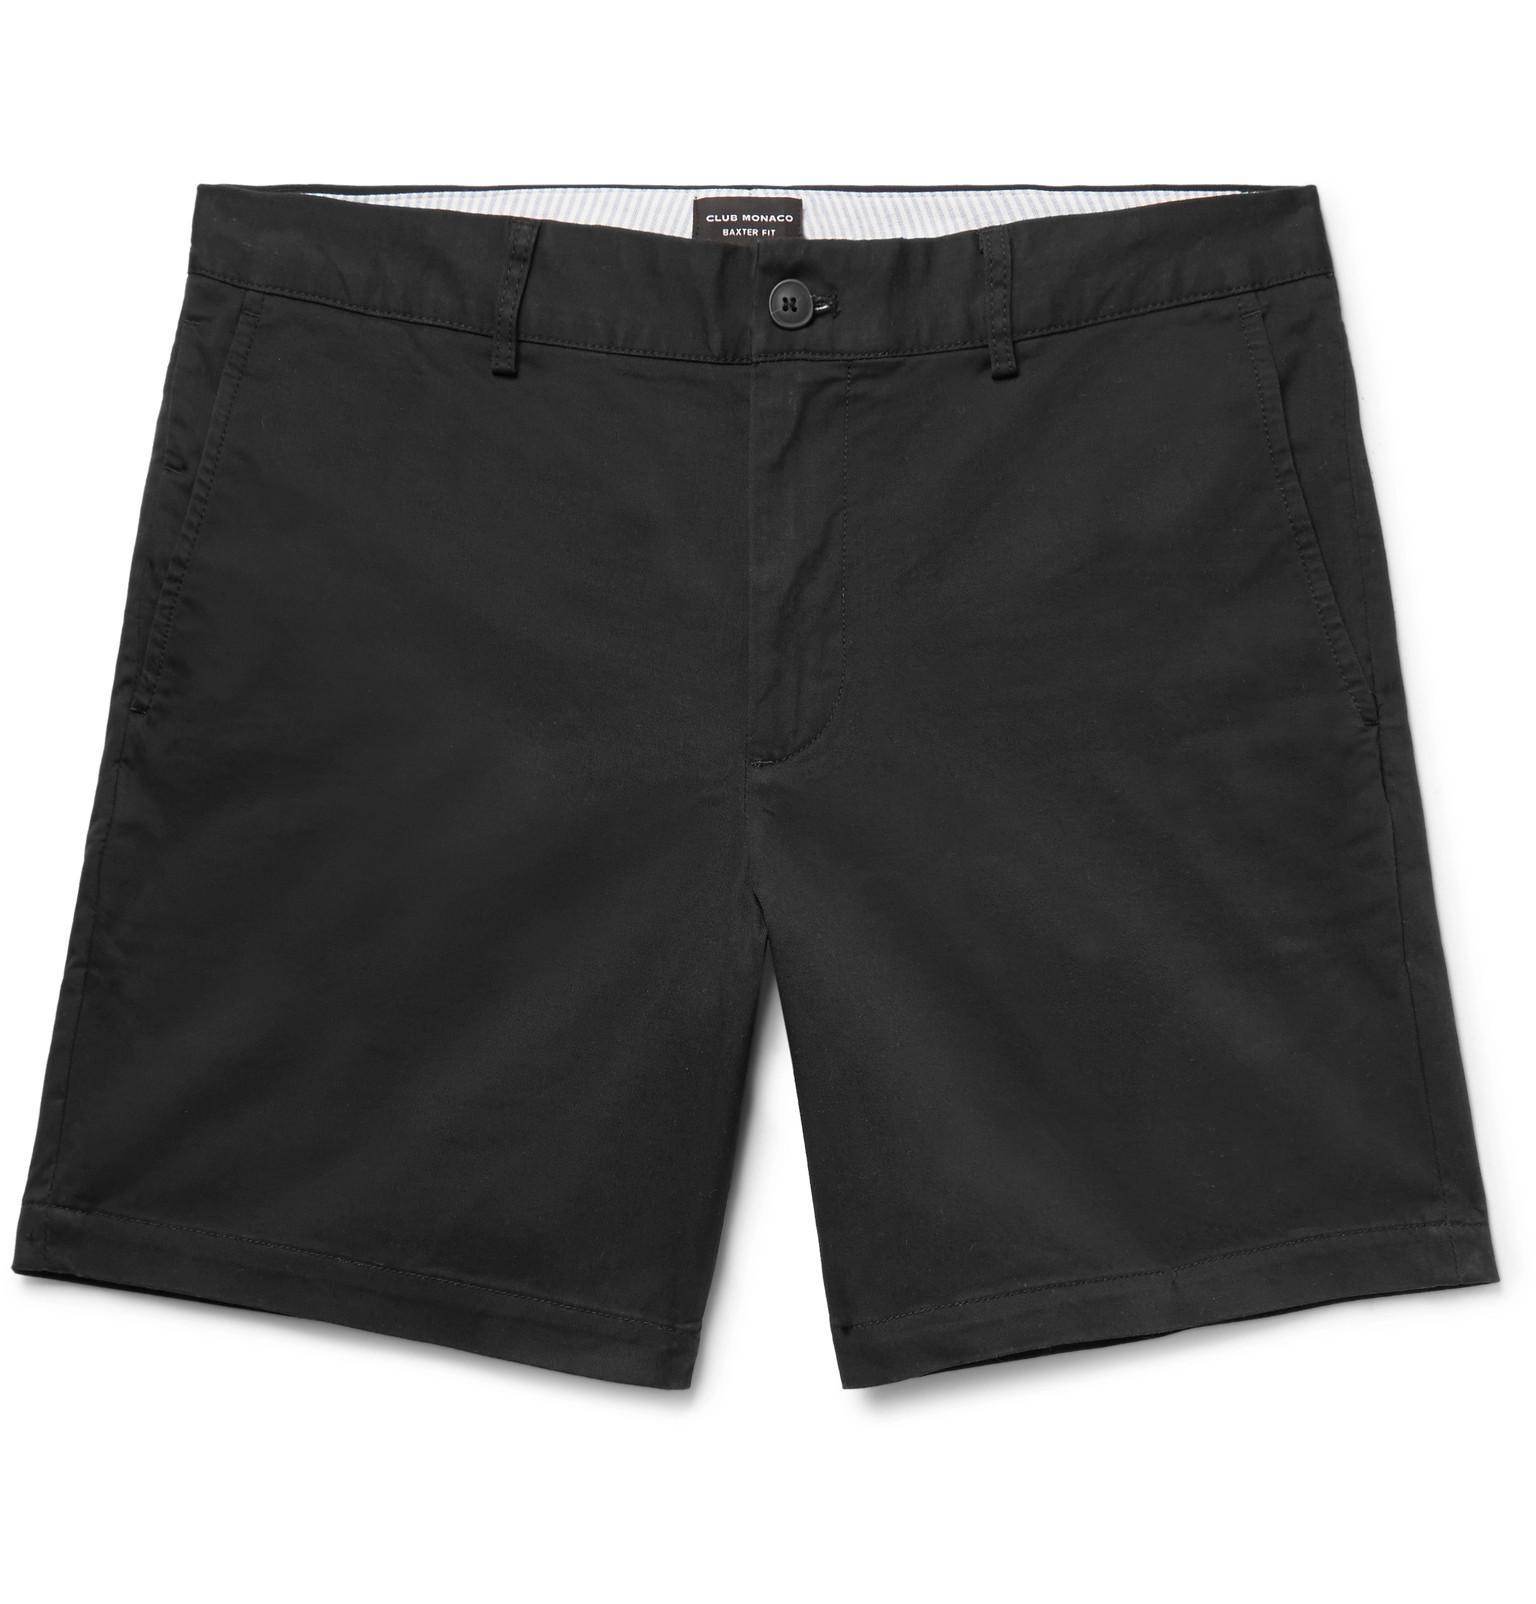 Baxter Slim-fit Stretch-cotton Twill Shorts Club Monaco PtrtZI5H